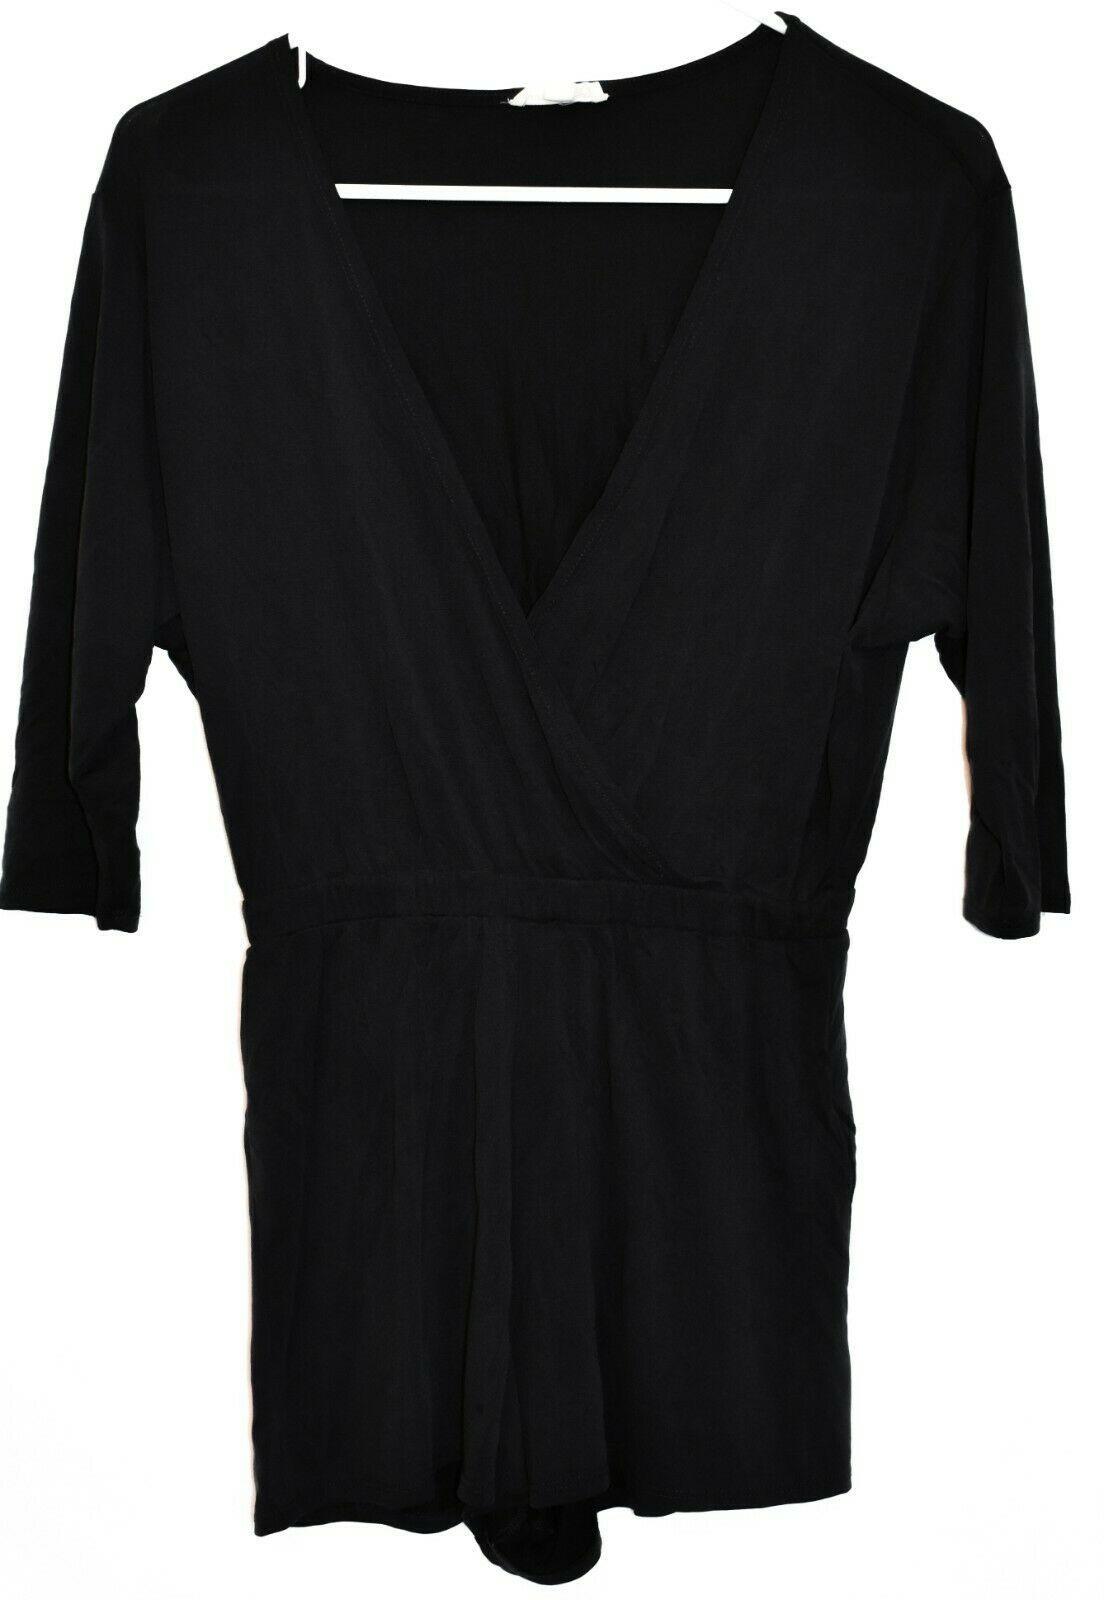 Silnce + Noise Women's Dark Gray Surplice V-Neck Romper Jumpsuit Size XS